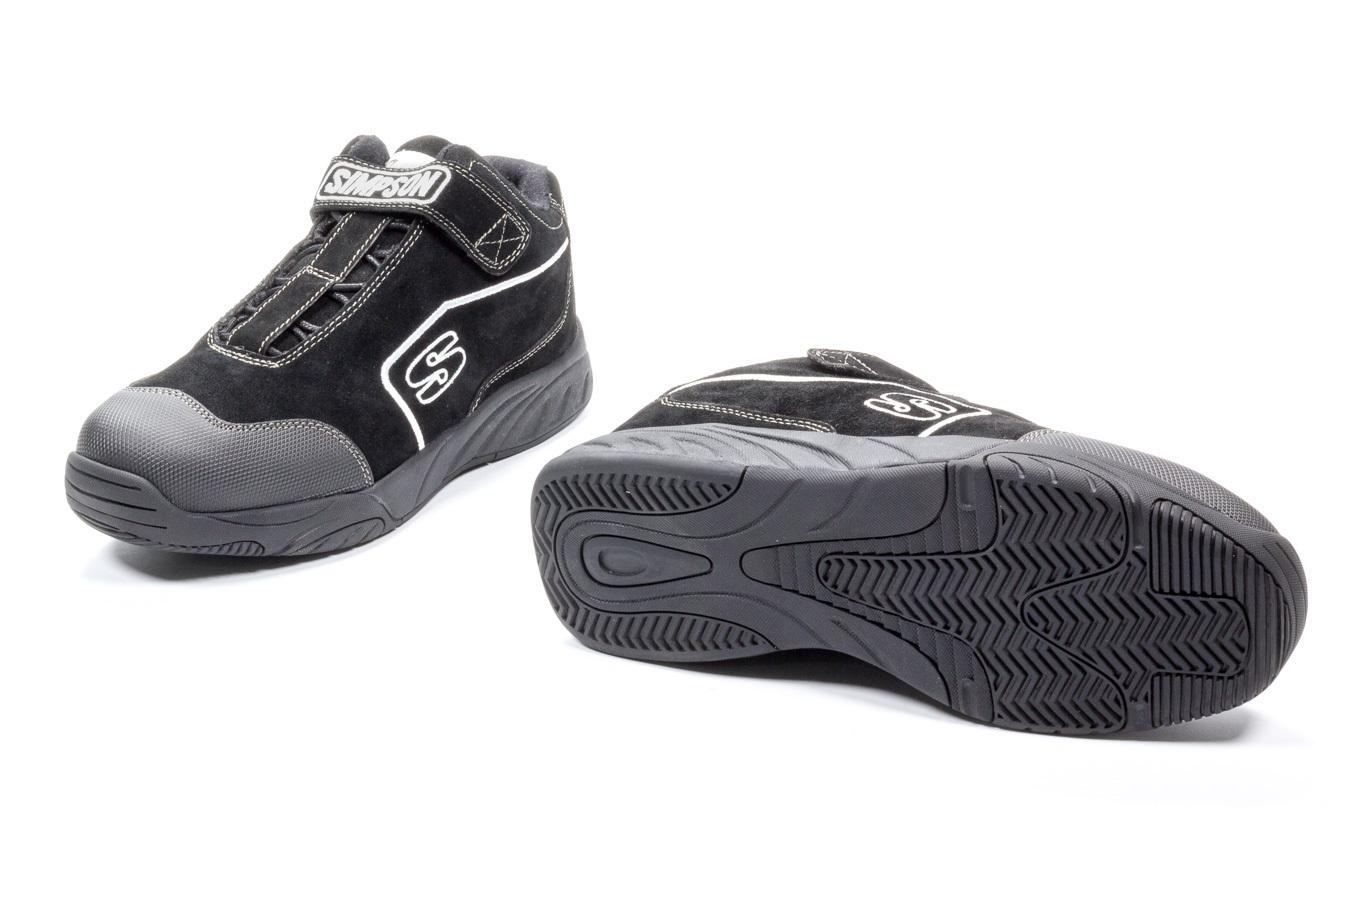 Simpson Safety Pit Box Shoe Size 10.5 Black